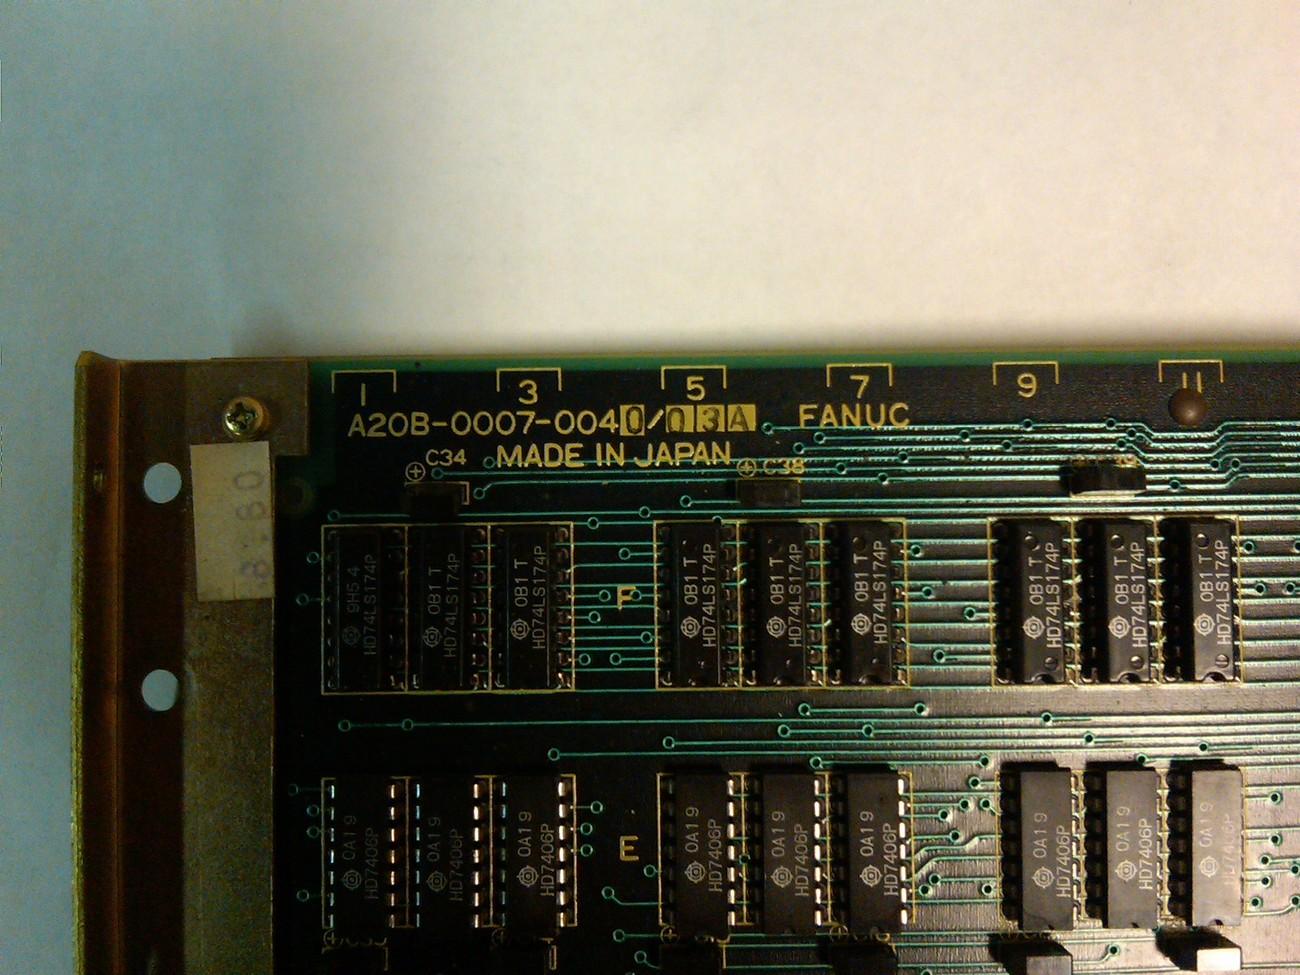 Fanuc 6M/T control I/O Relay PC Board A20B-0007-0040